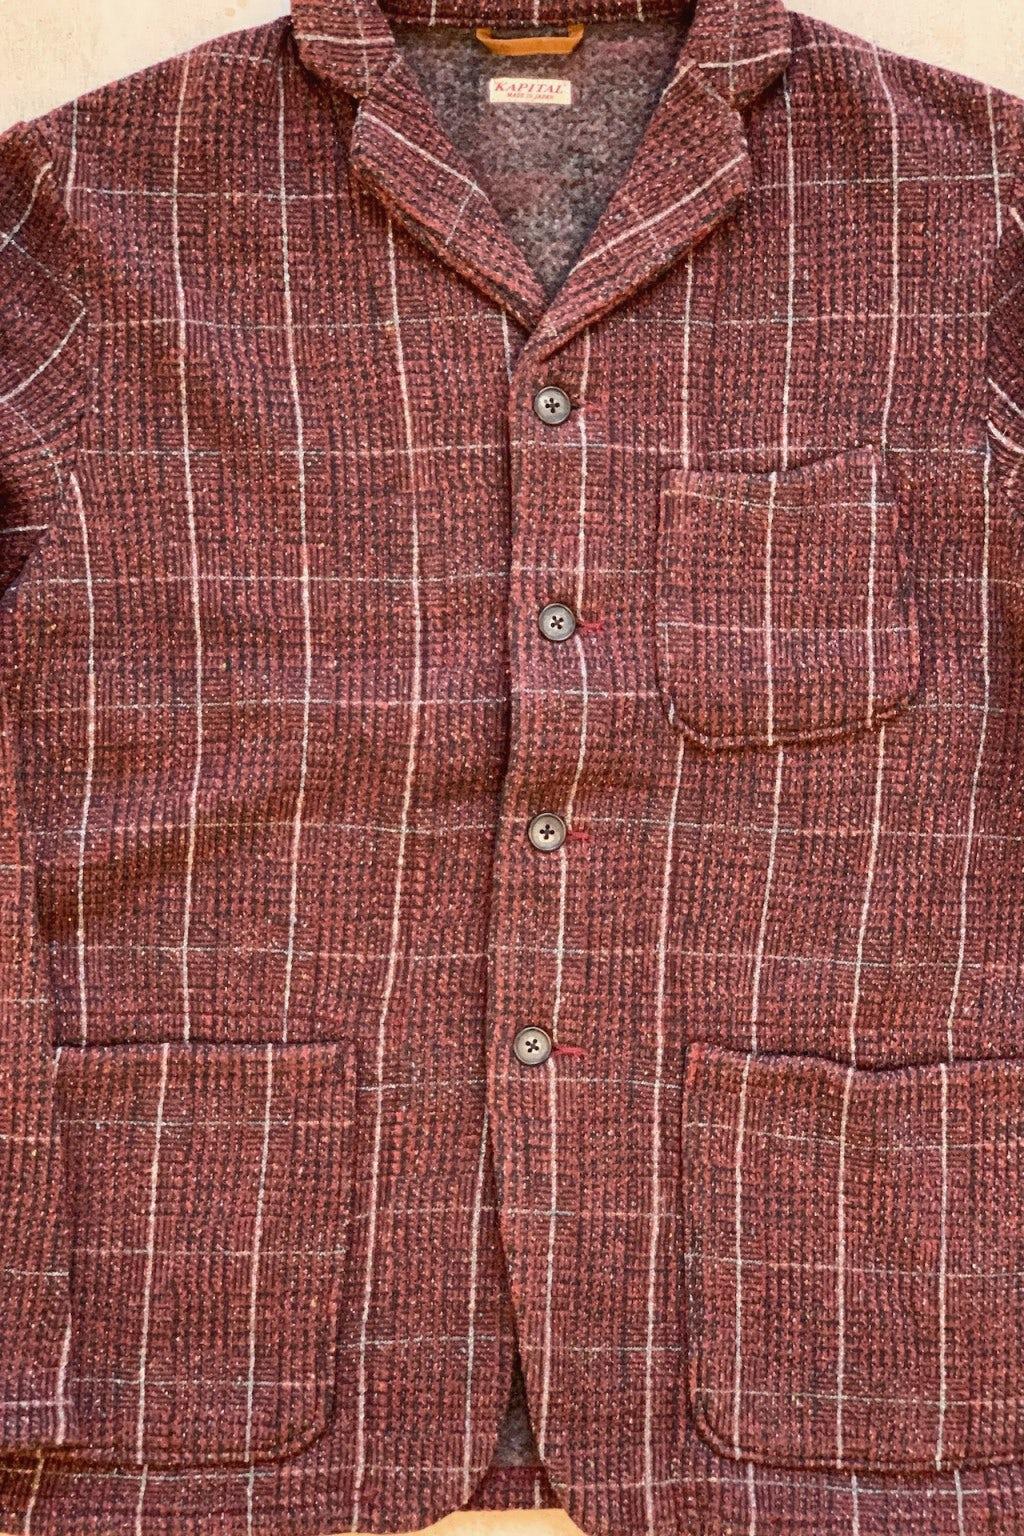 Kapital Tweed Fleecy Knit KOBE Jacket Burgundy